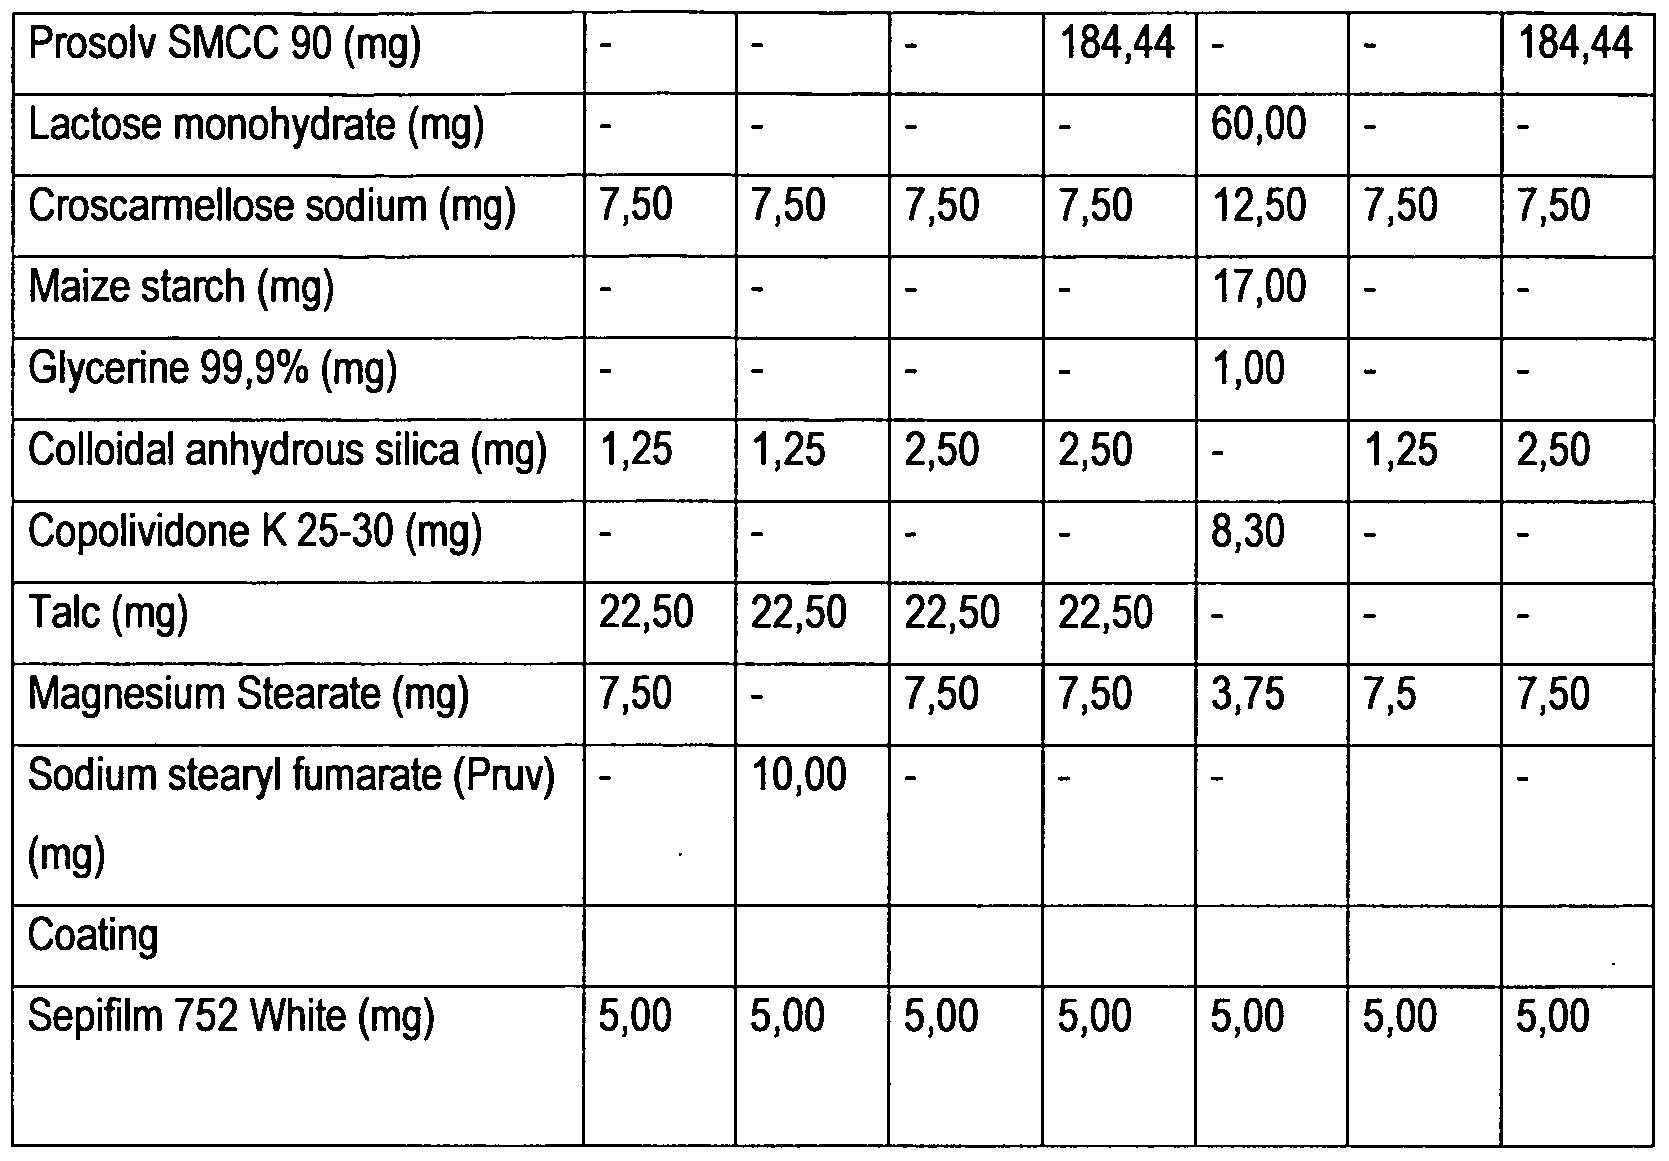 Levofloxacin hemihydrate usp 35 monograph.doc - Figure Imgf000054_0001